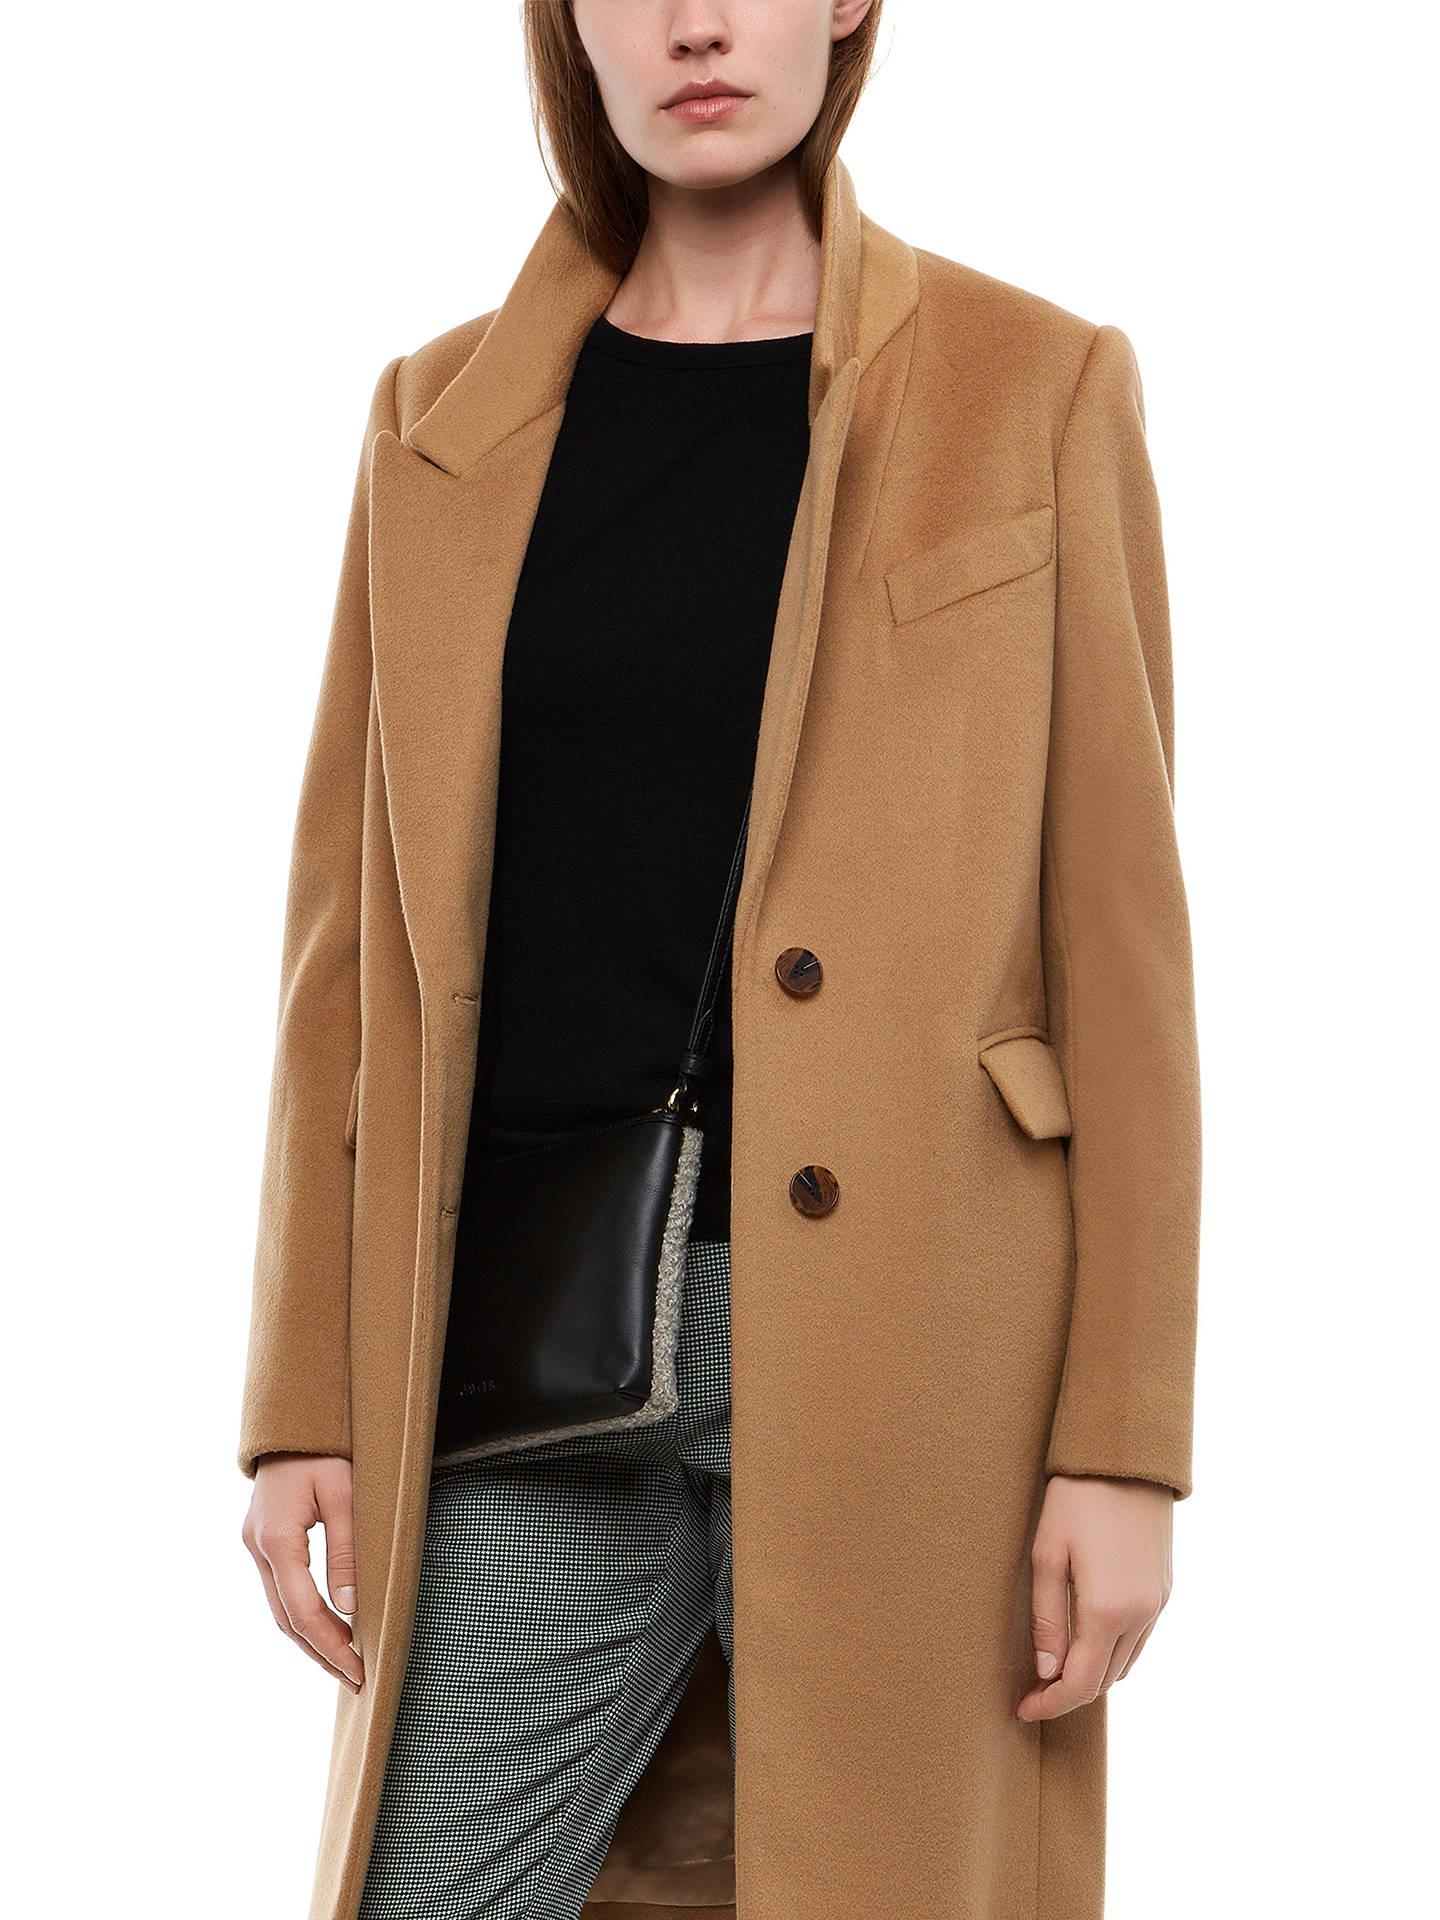 Jaeger Wool Cashmere Boyfriend Coat at John Lewis & Partners